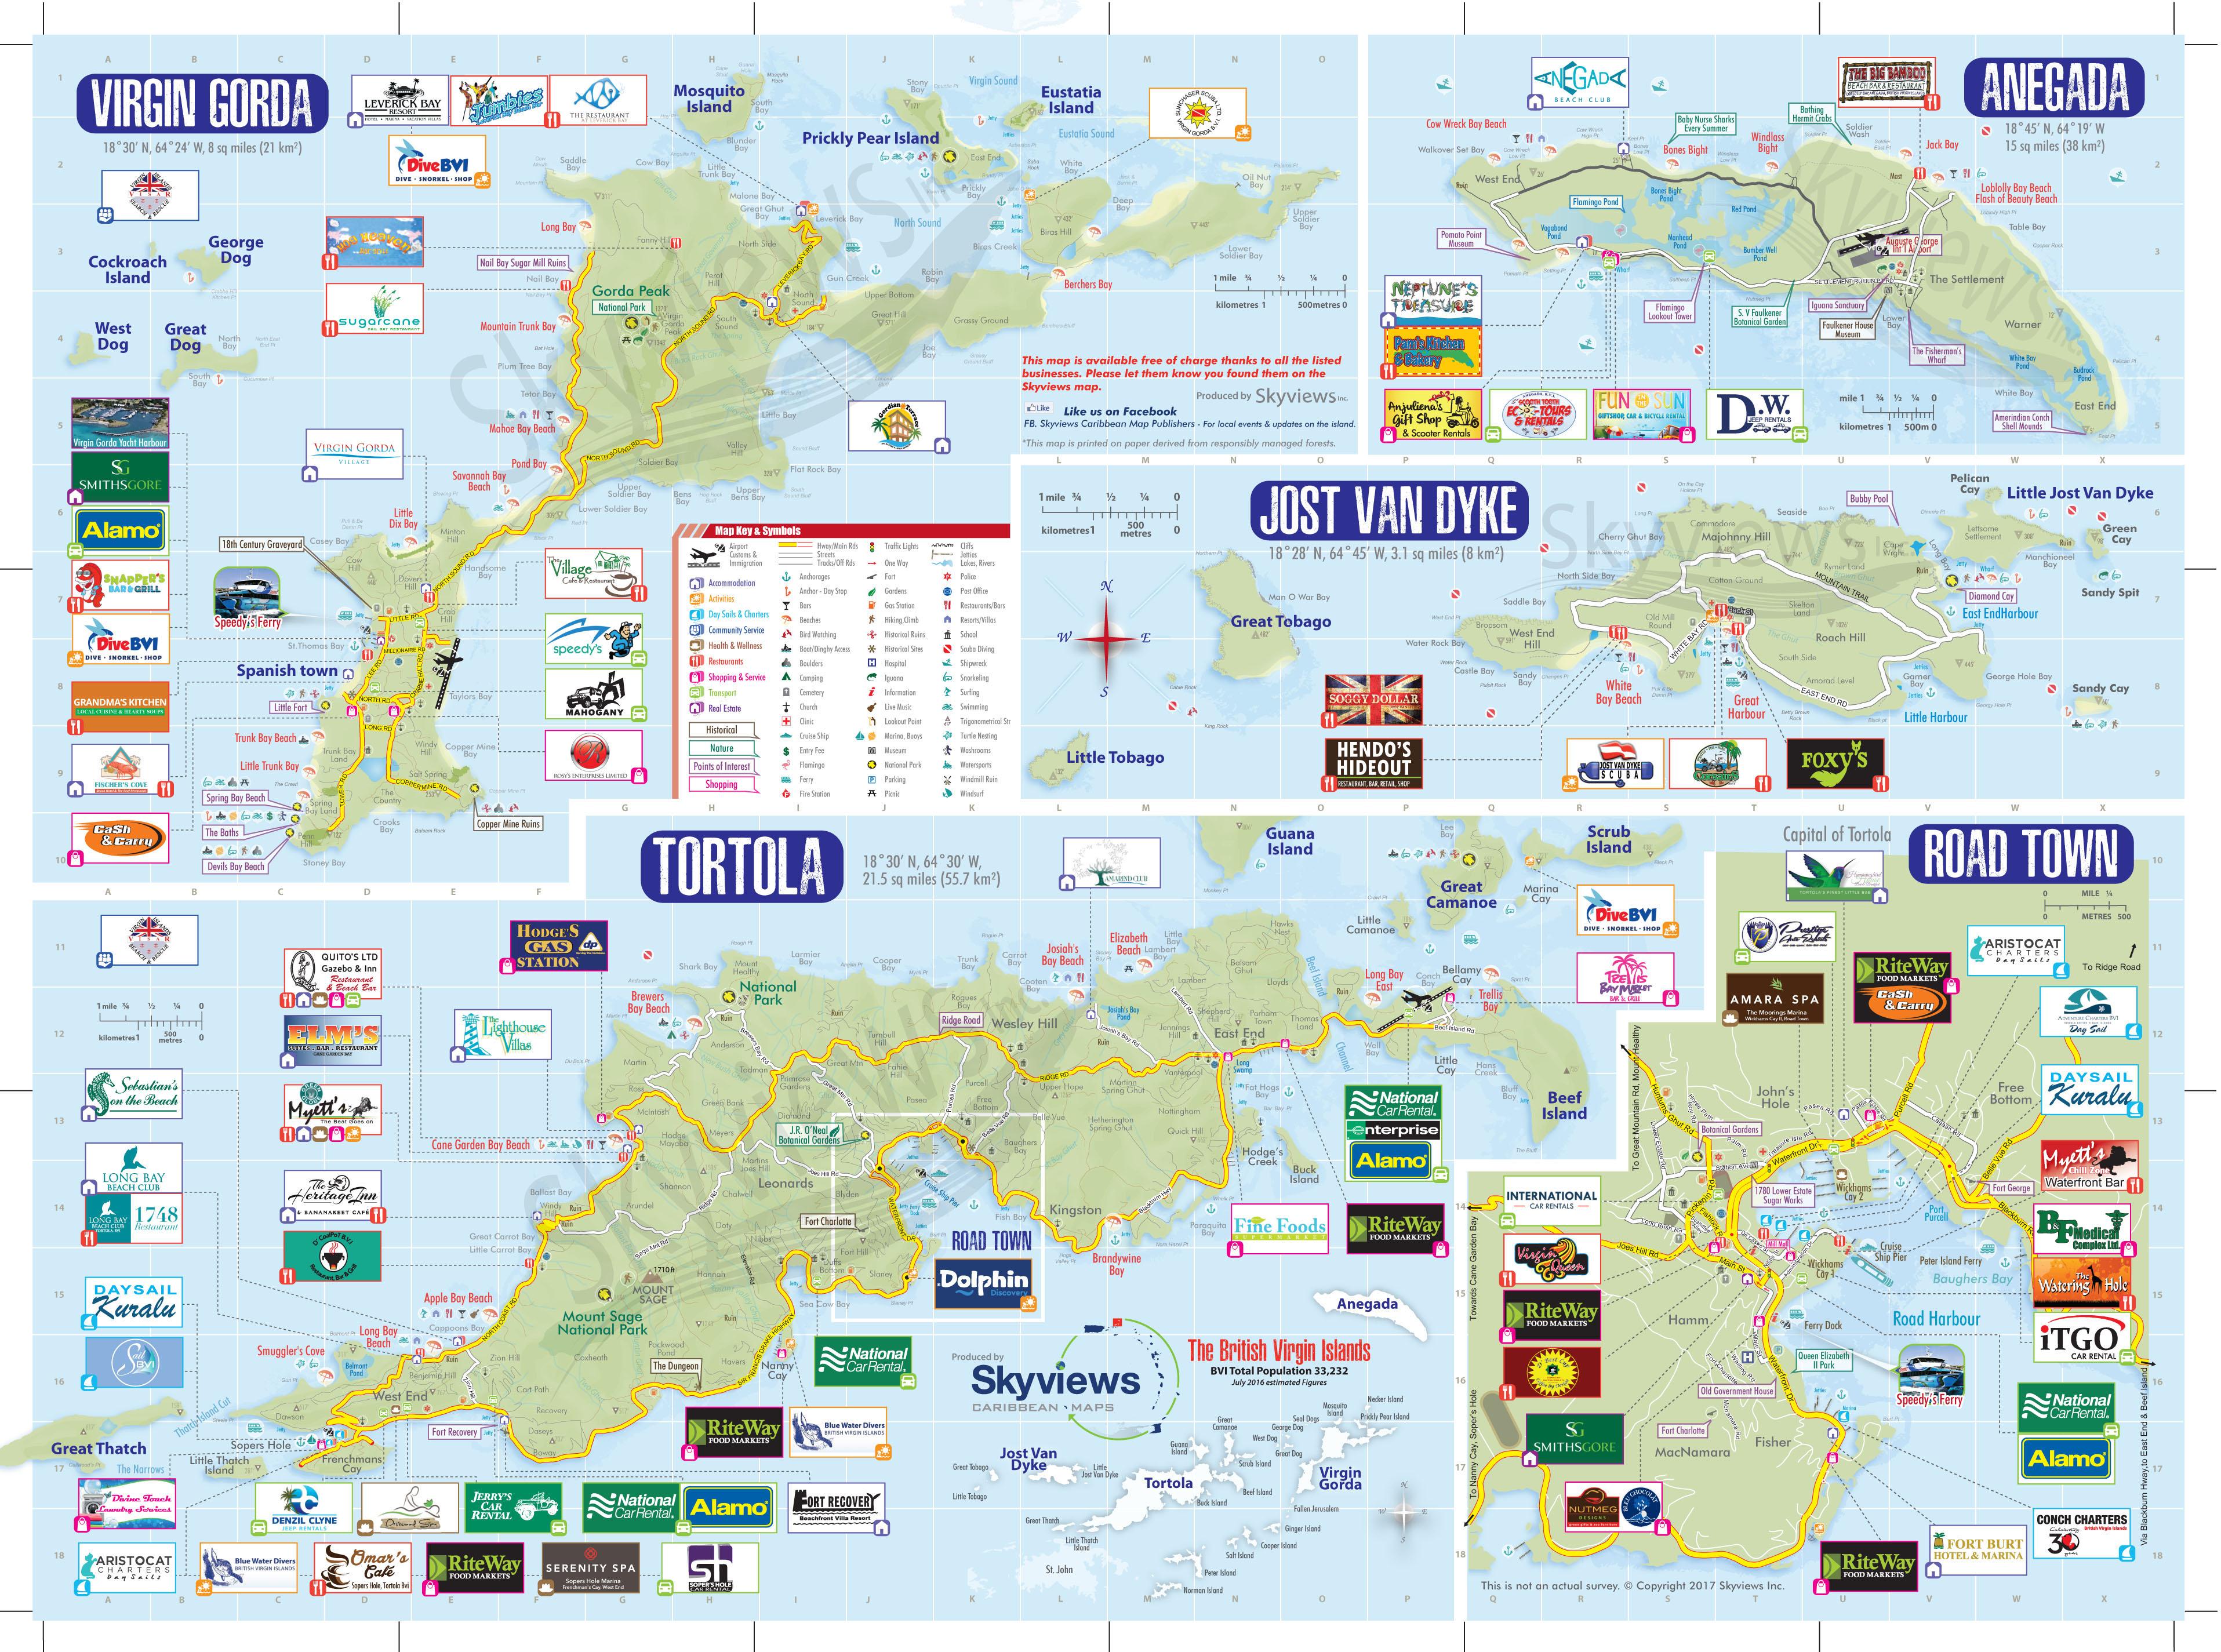 Map Of British Virgin Islands Caribbean Islands Maps And Guides - Map-of-us-virgin-islands-and-british-virgin-islands